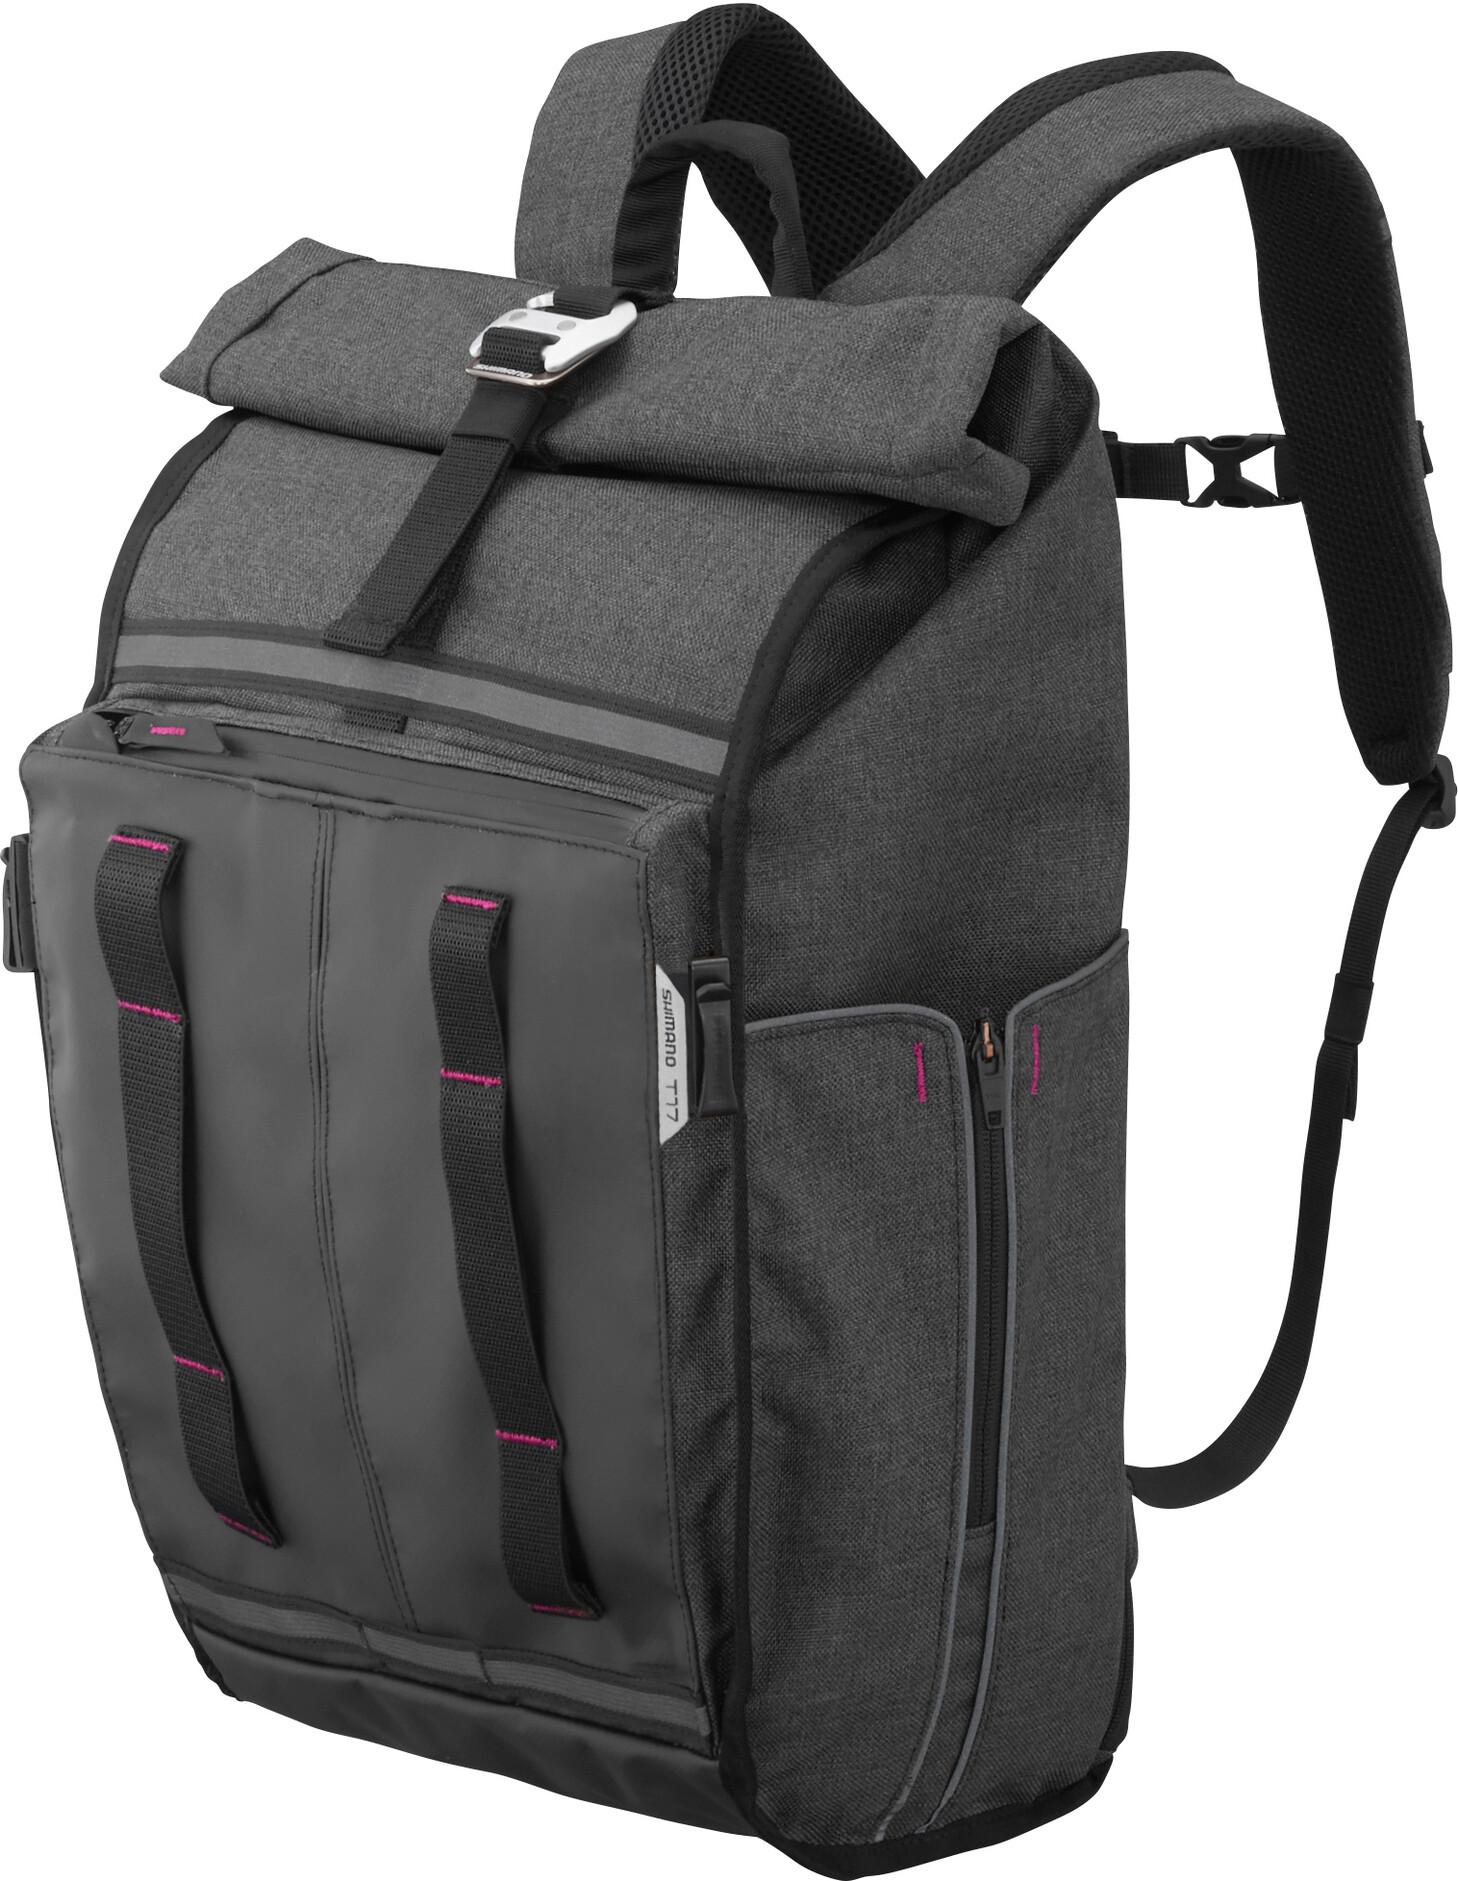 Shimano Tokyo 17 Backpack 17L, black (2019) | Travel bags